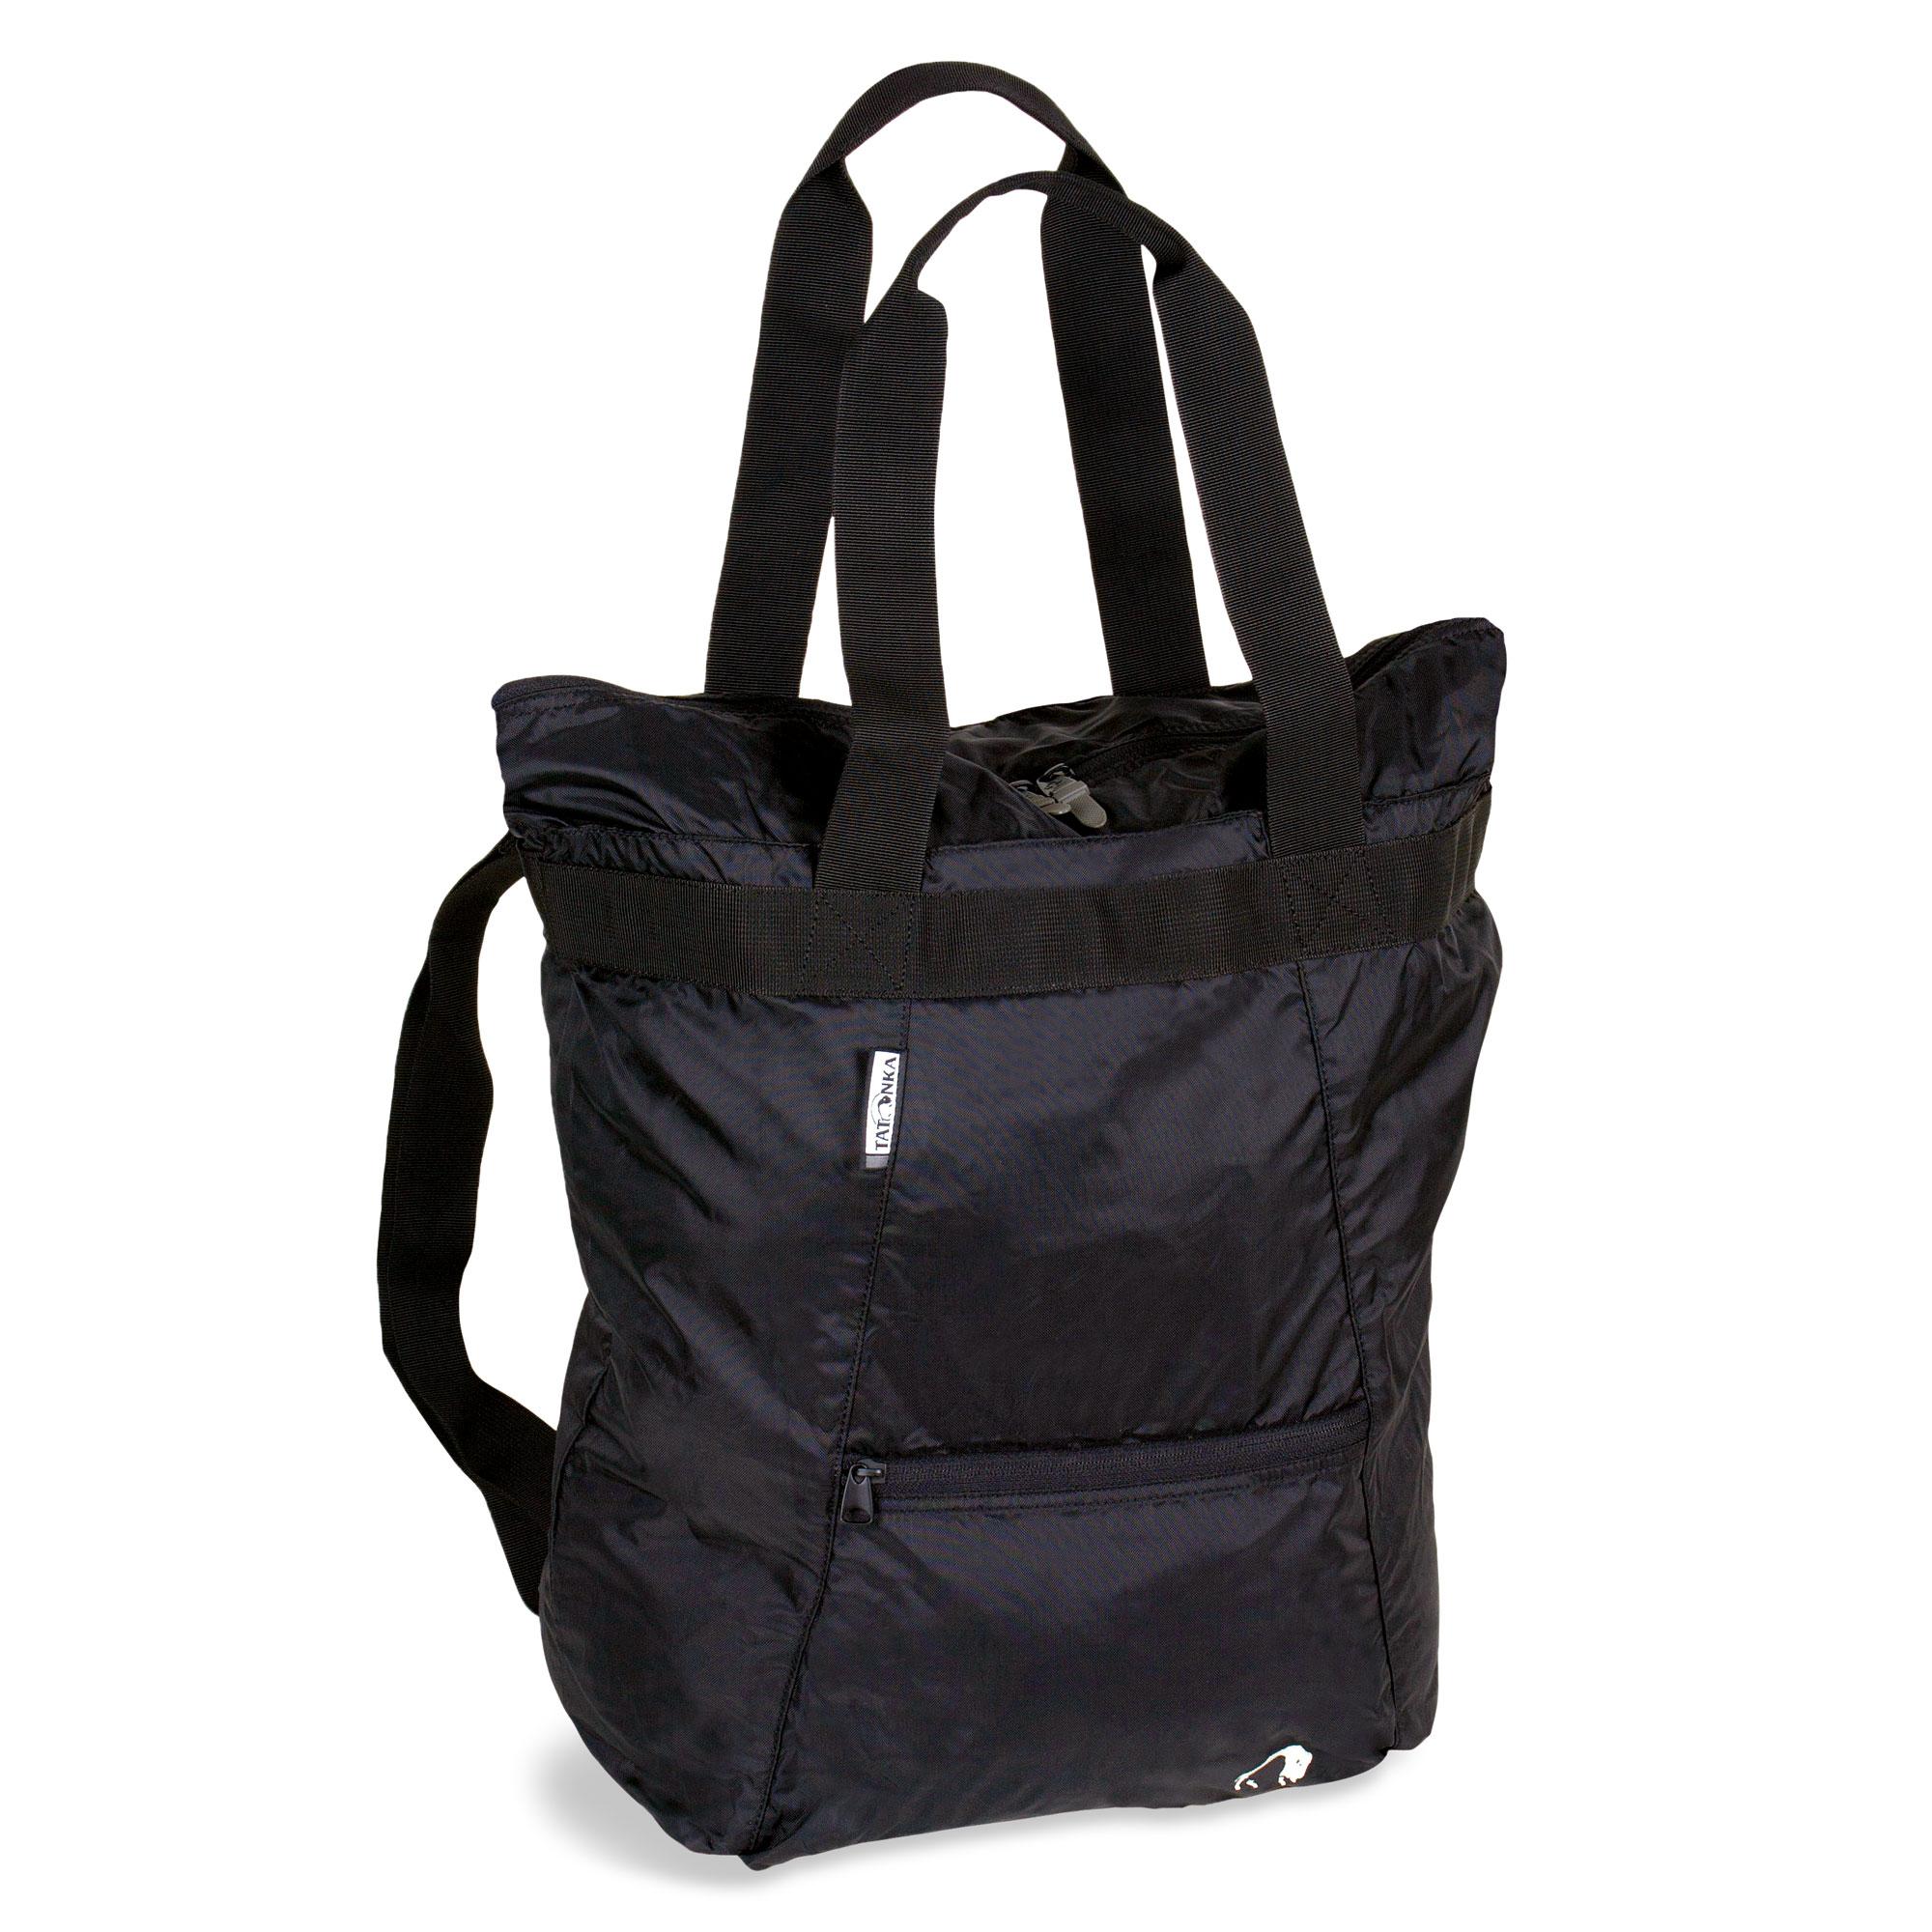 Сумка Tatonka Market Bag. product.